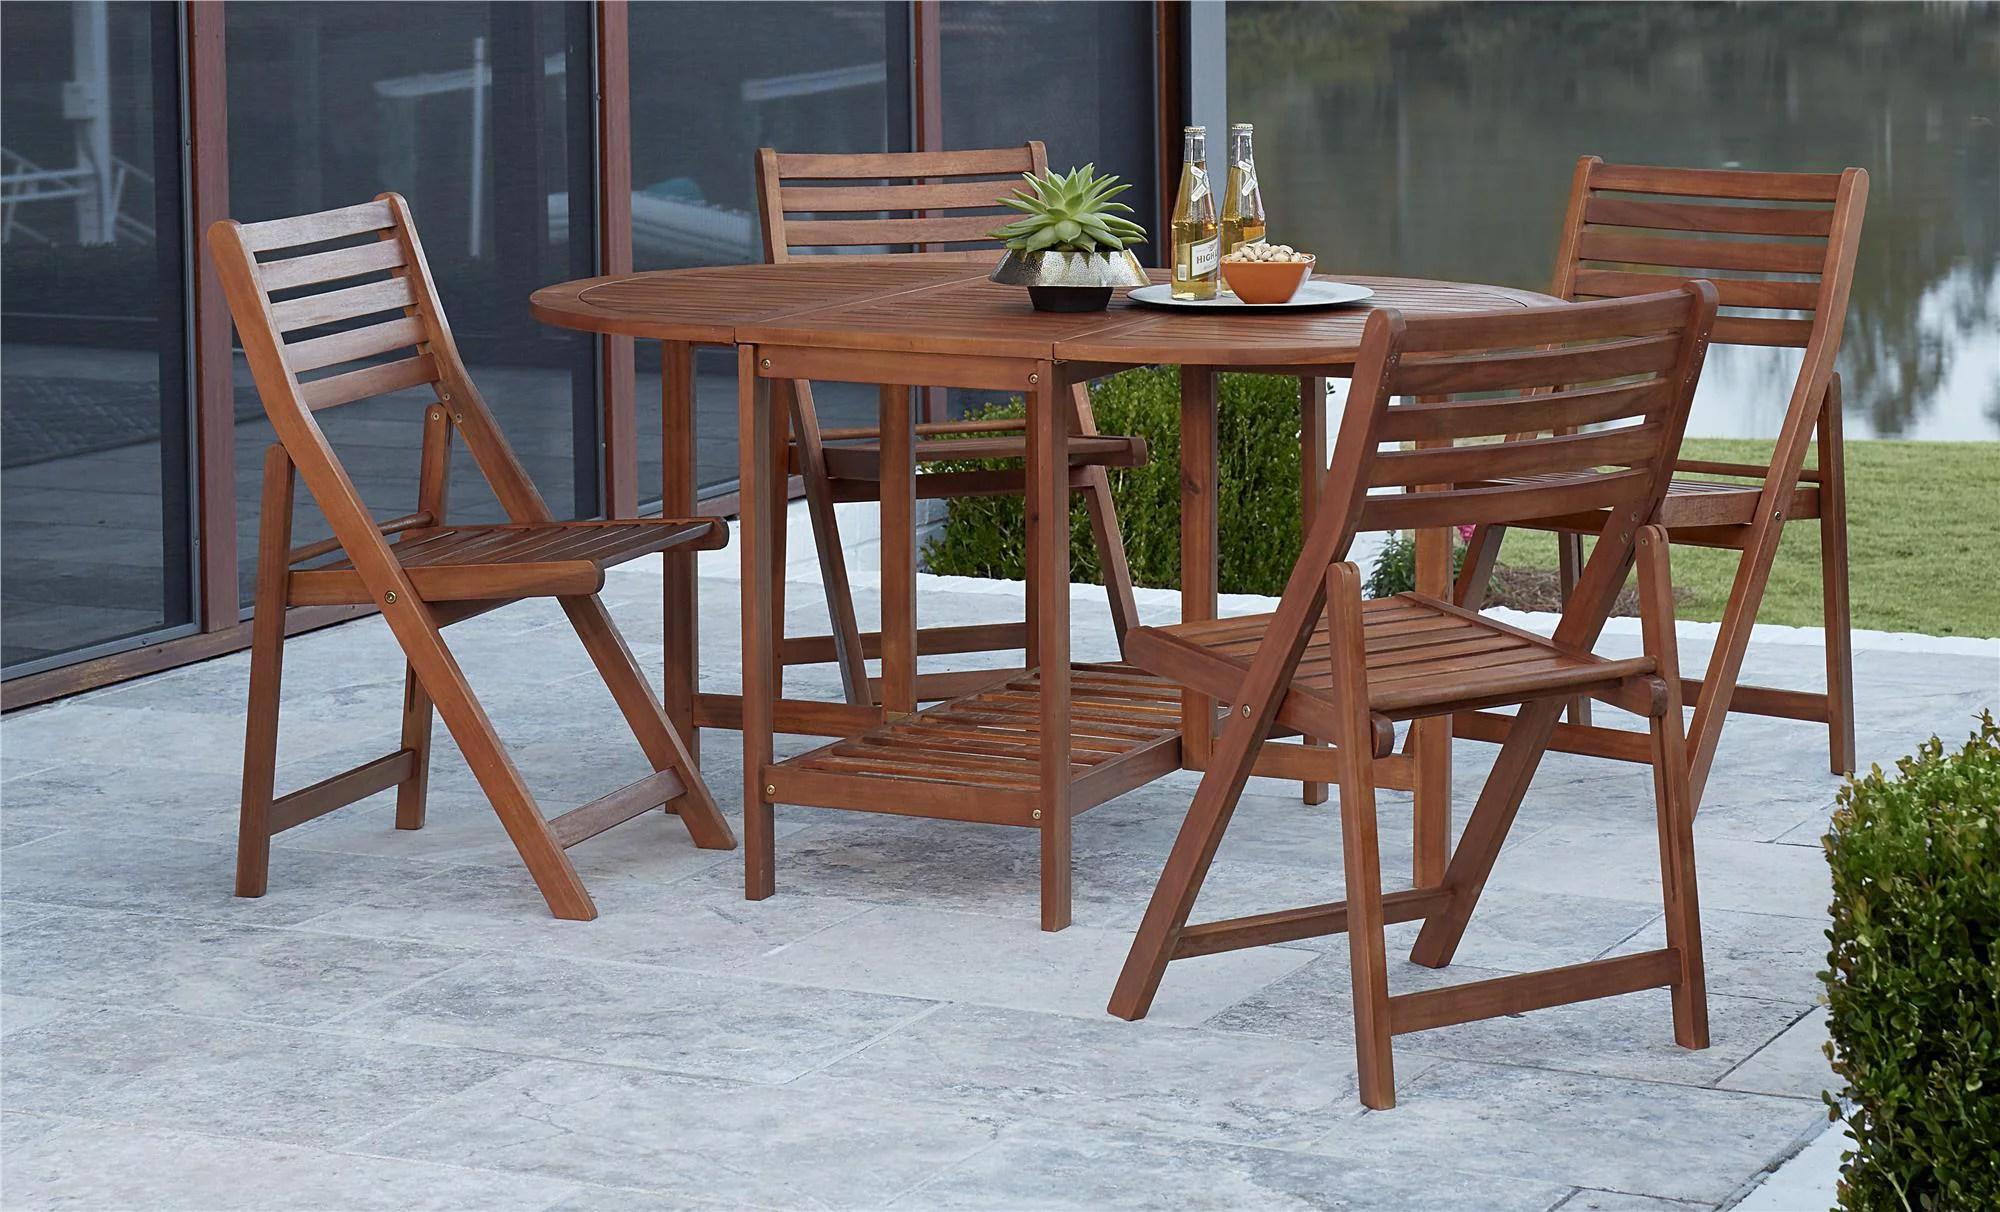 COSCO Outdoor Living 5 Piece Acacia Wood Patio Dining